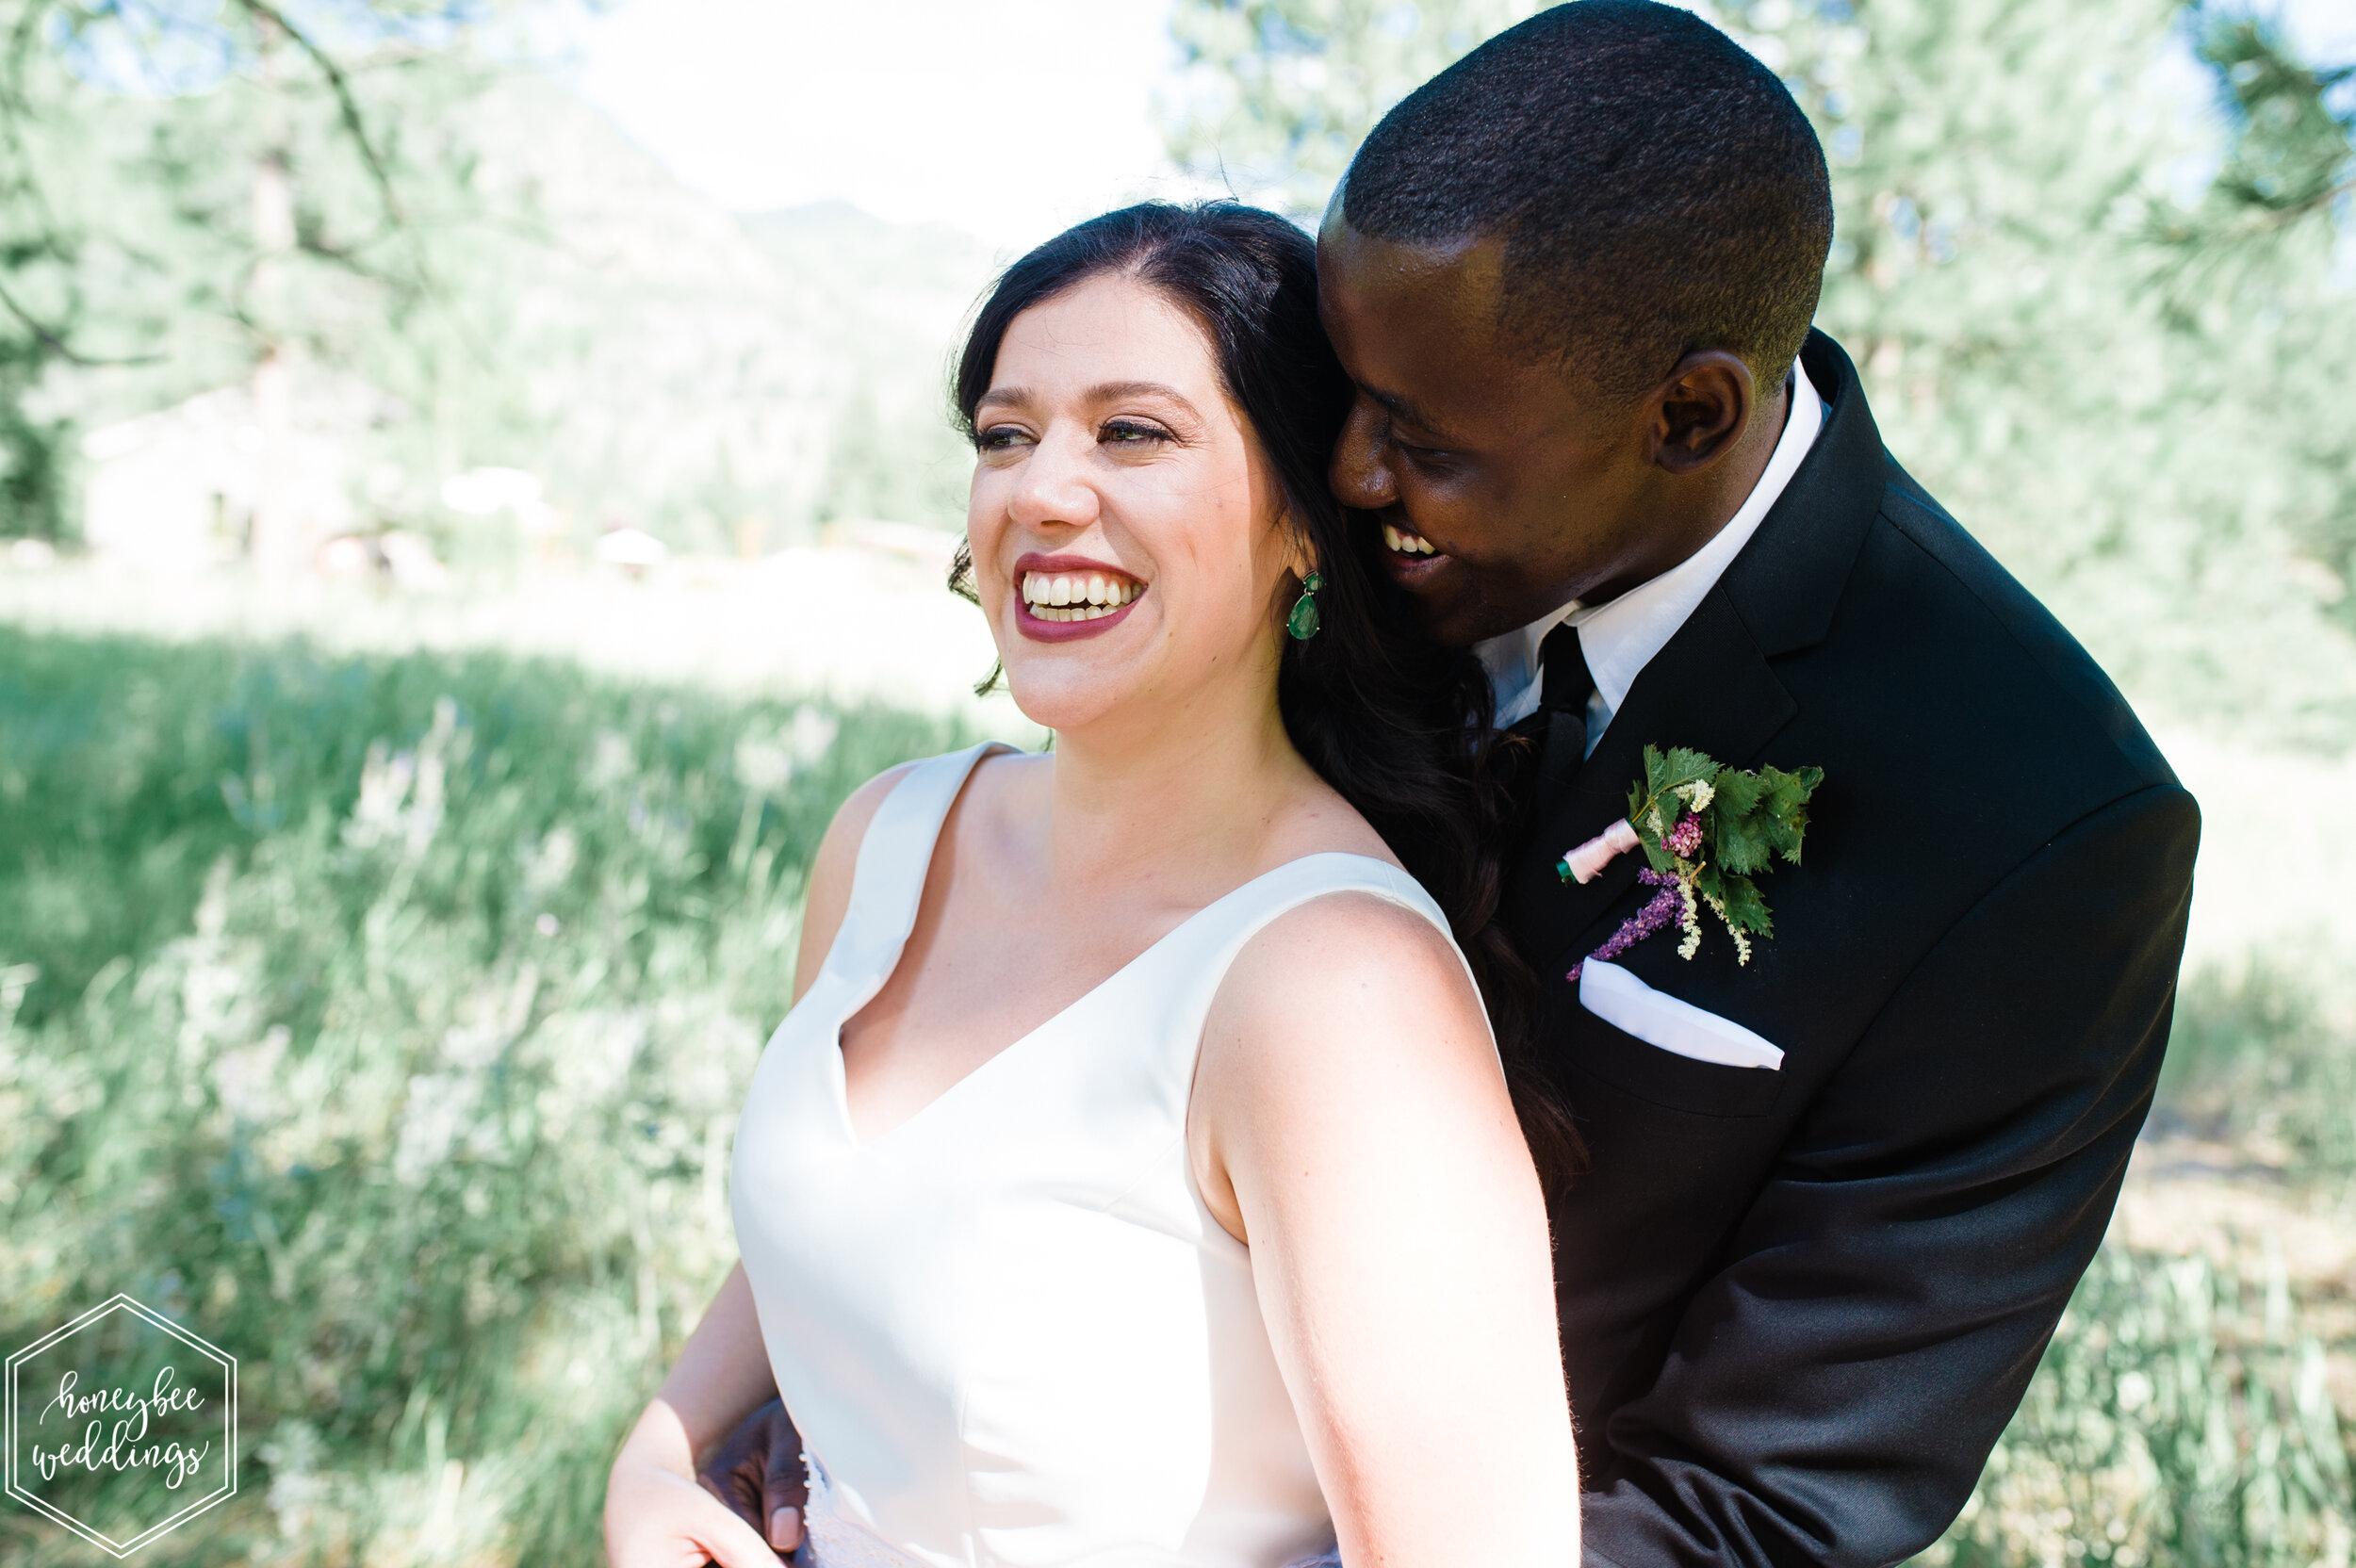 088White Raven Wedding_Montana Wedding Photographer_Rebekah & Likom_Honeybee Weddings_July 27, 2019-1127.jpg